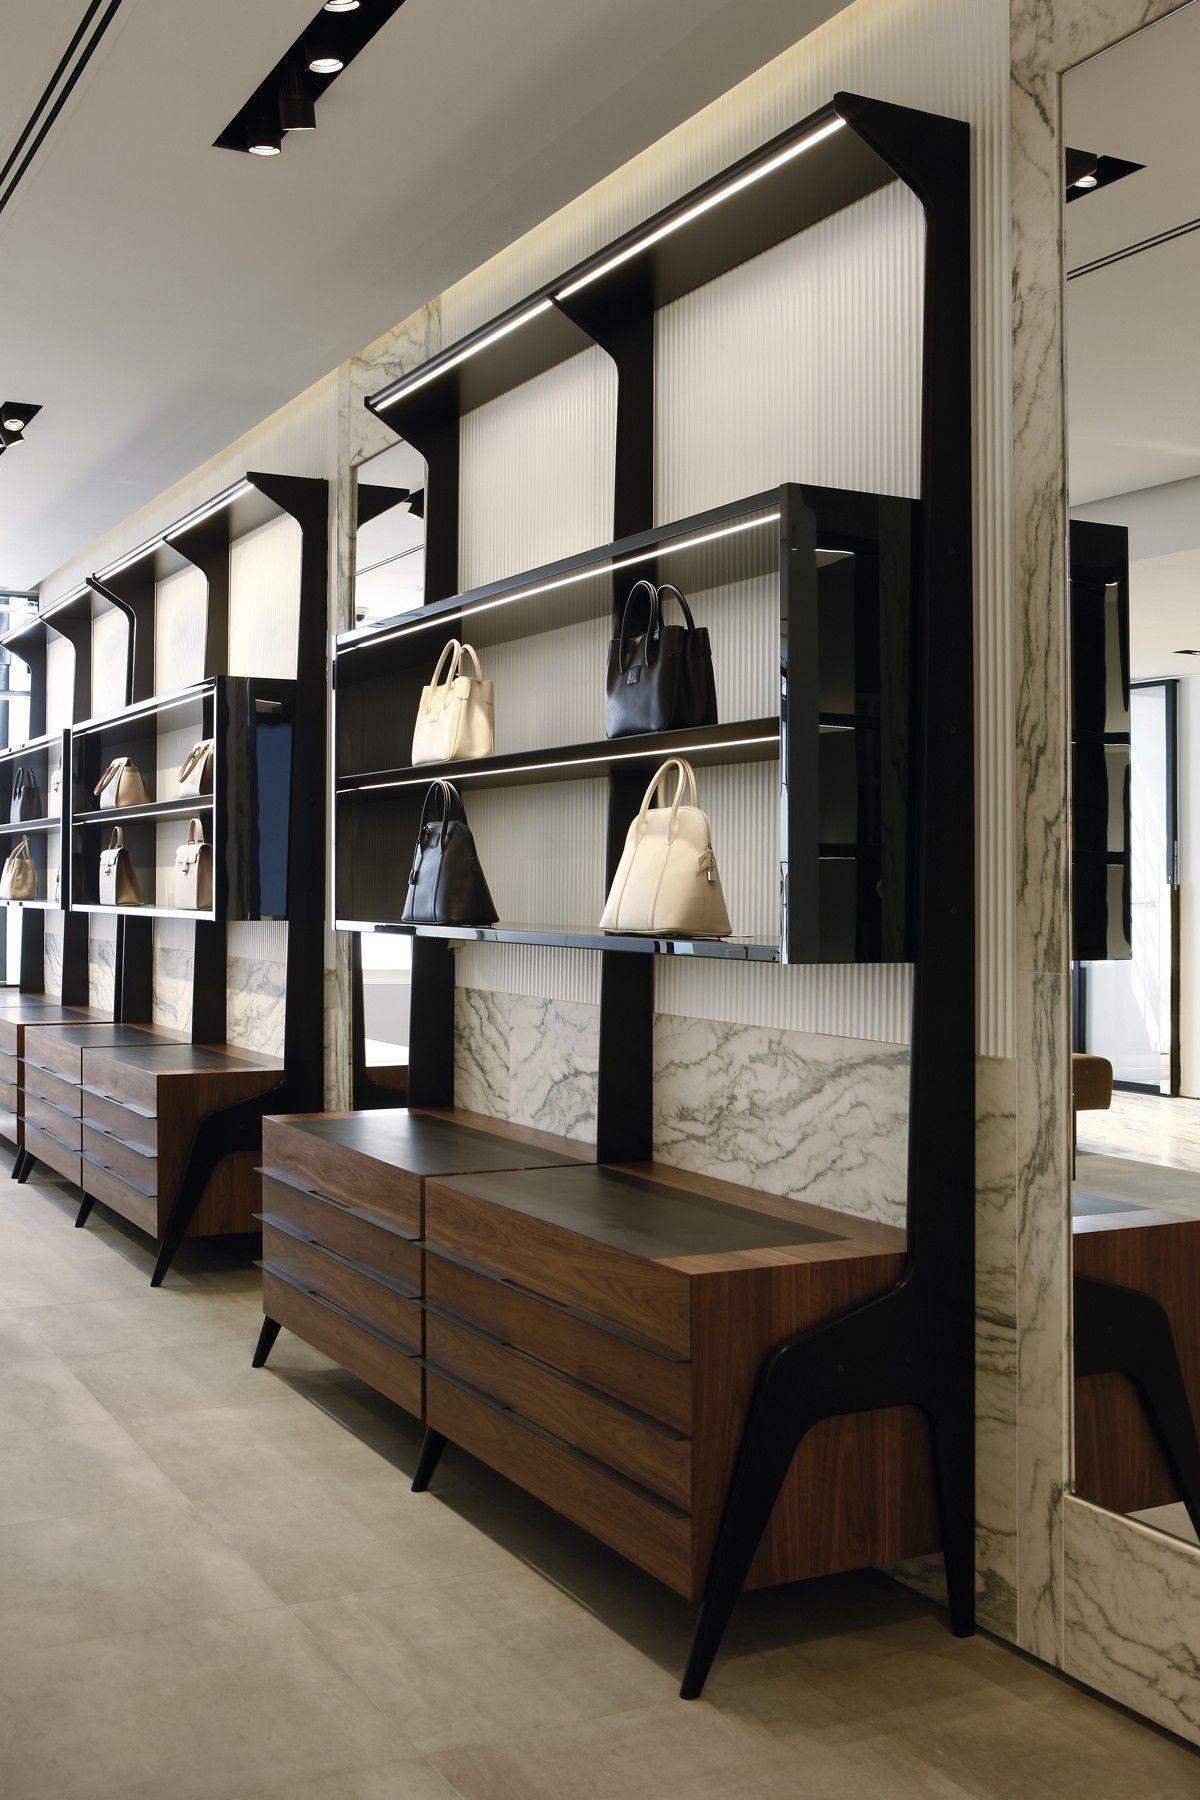 Study of architecture planning and interior design fabio fantolino turin also rh pinterest